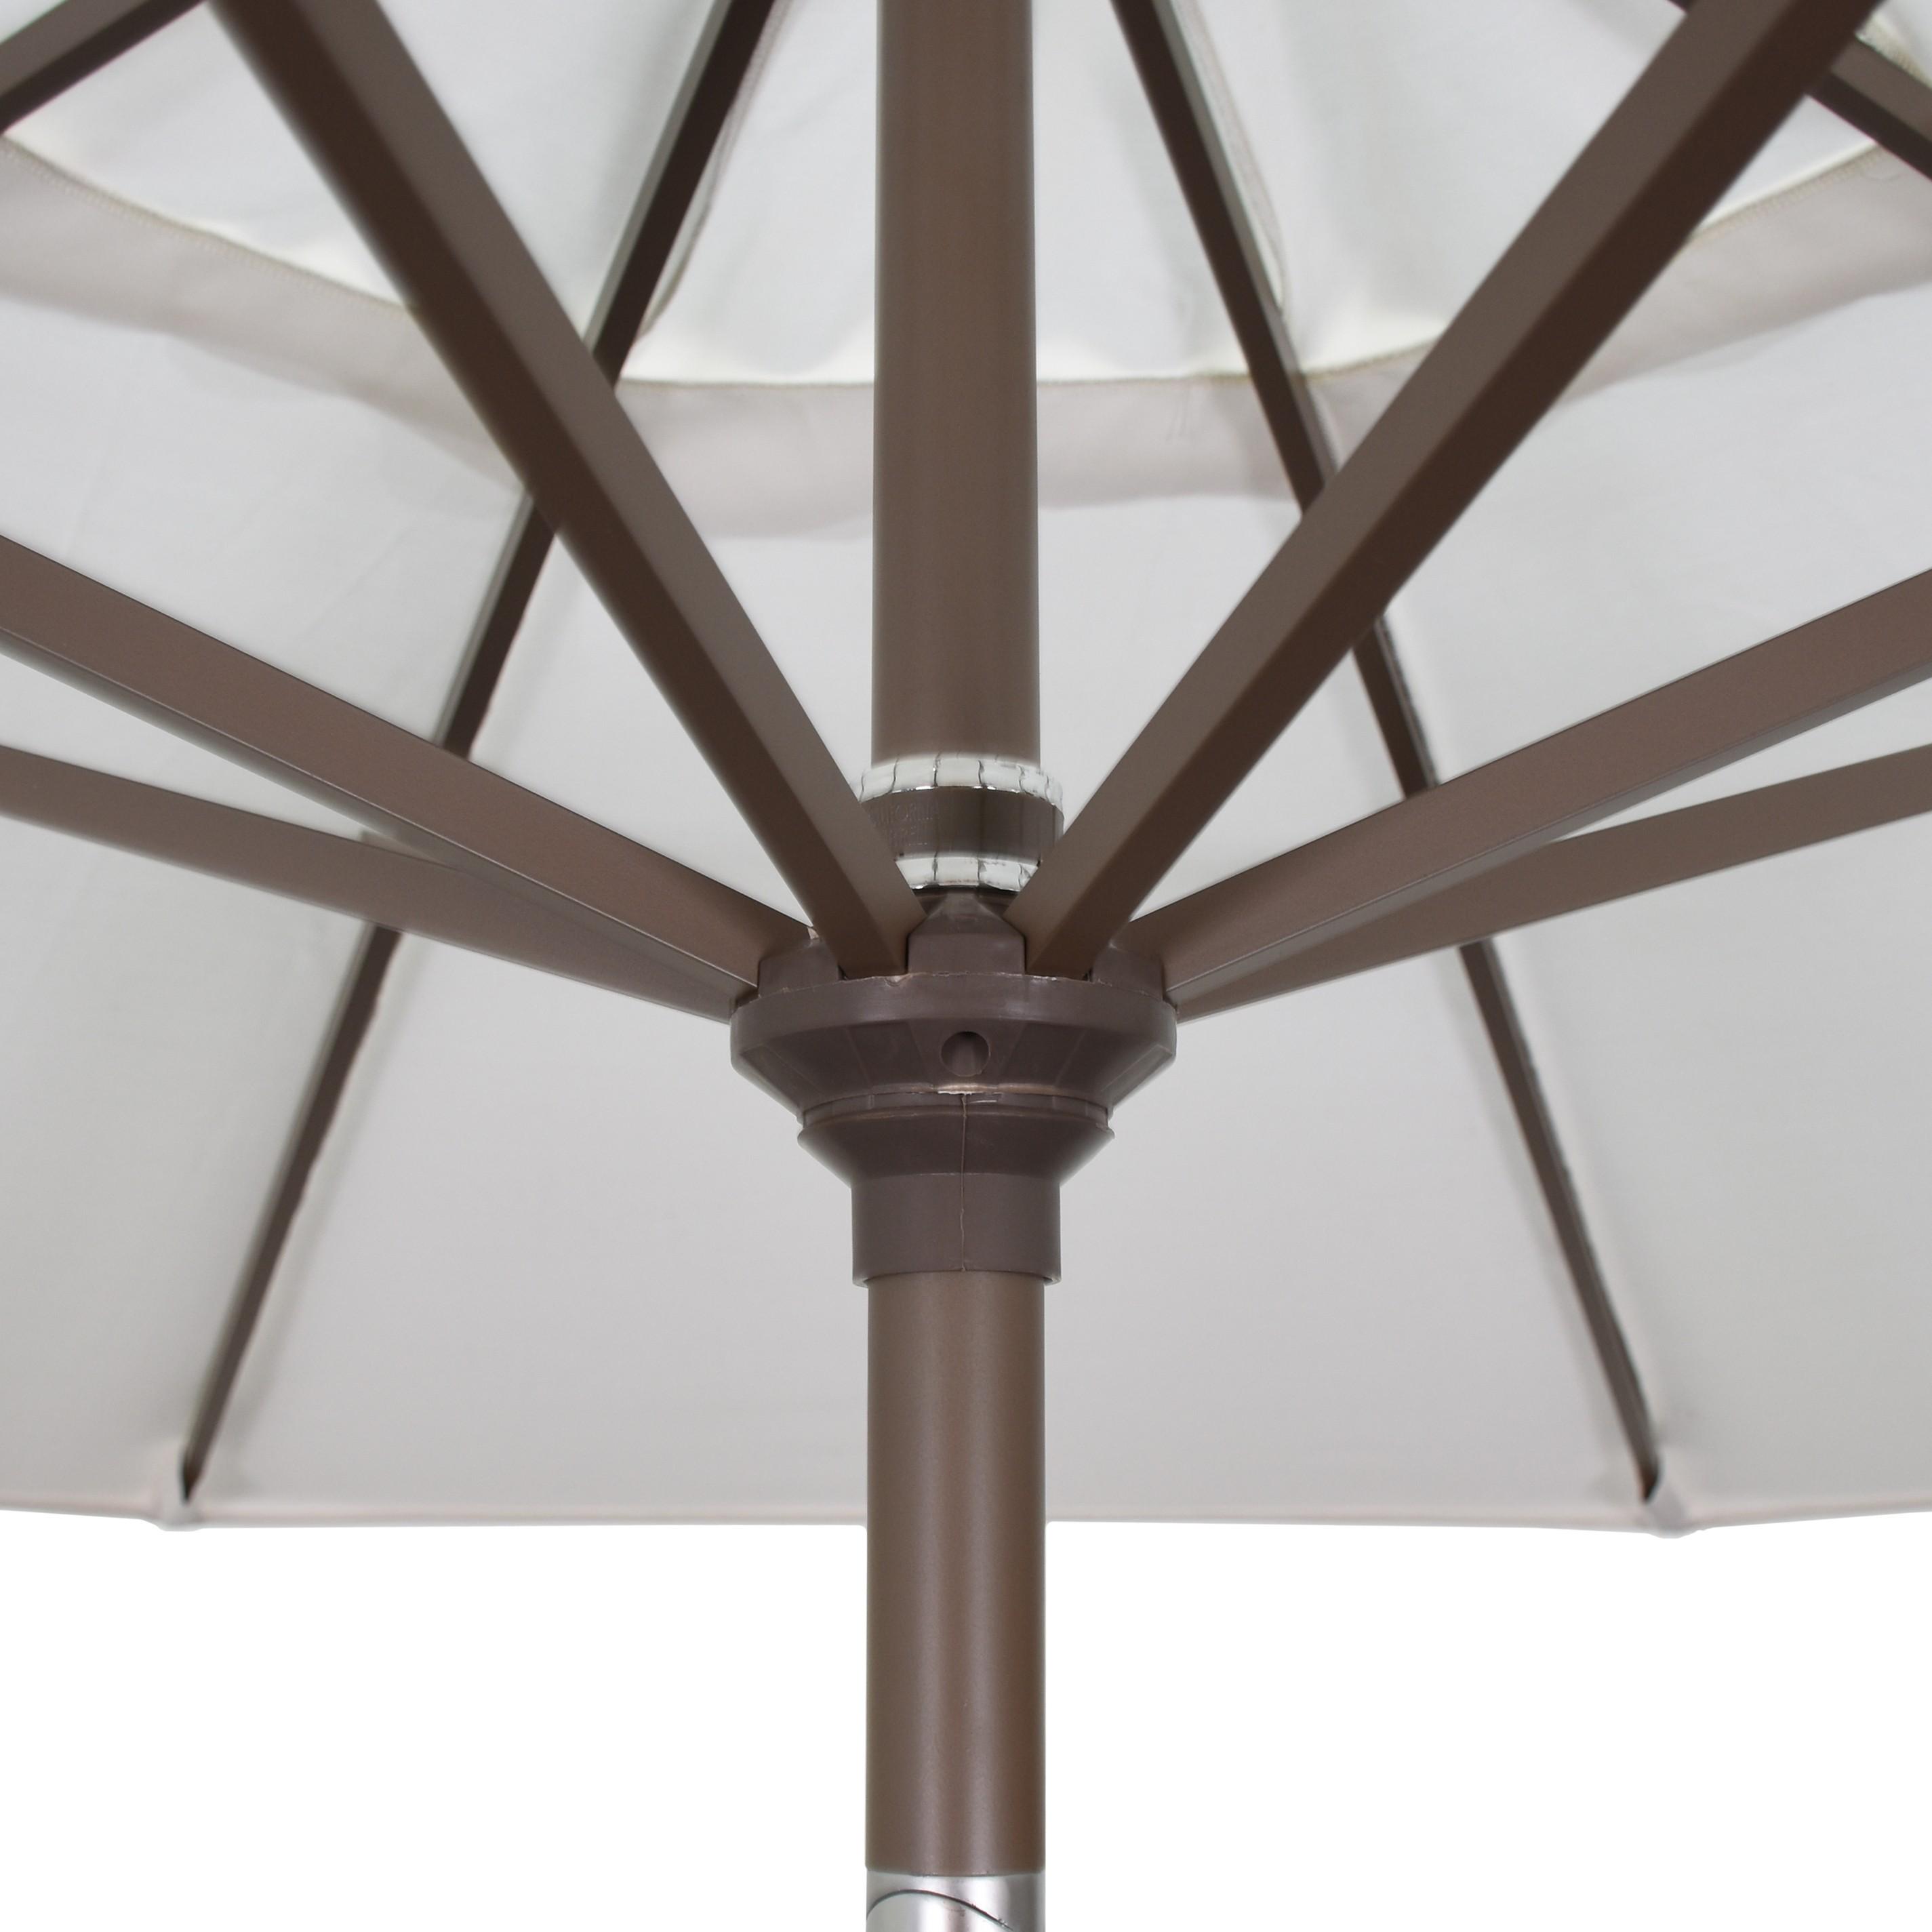 9' Market Style Outdoor Umbrella with Wind Vent Cabana Regatta